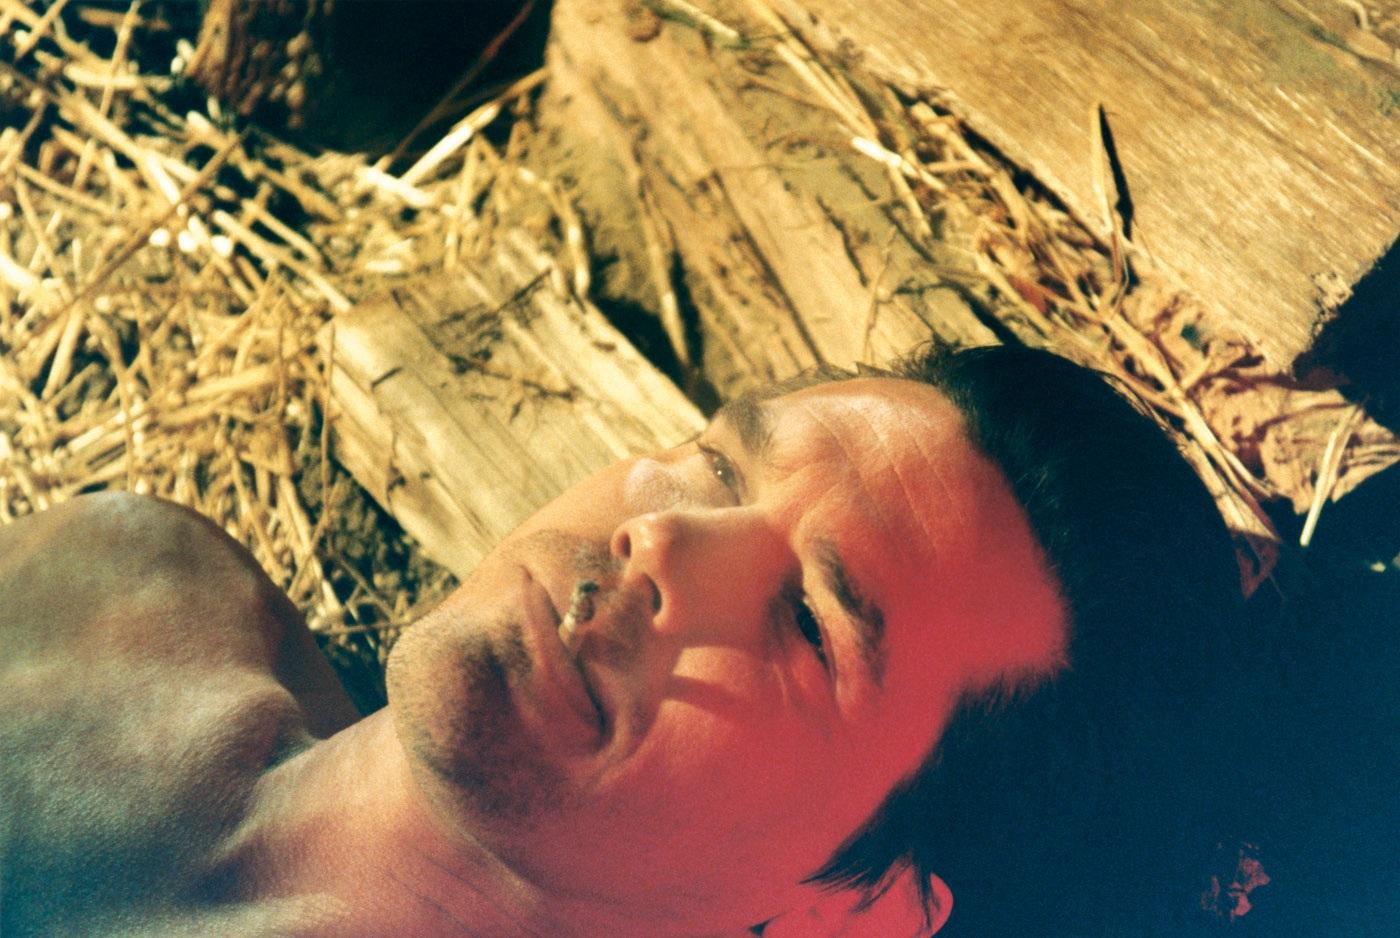 Josh Brolin, NY Times Magazine, 2008 Oscars Portfolio, February 10, 2008.